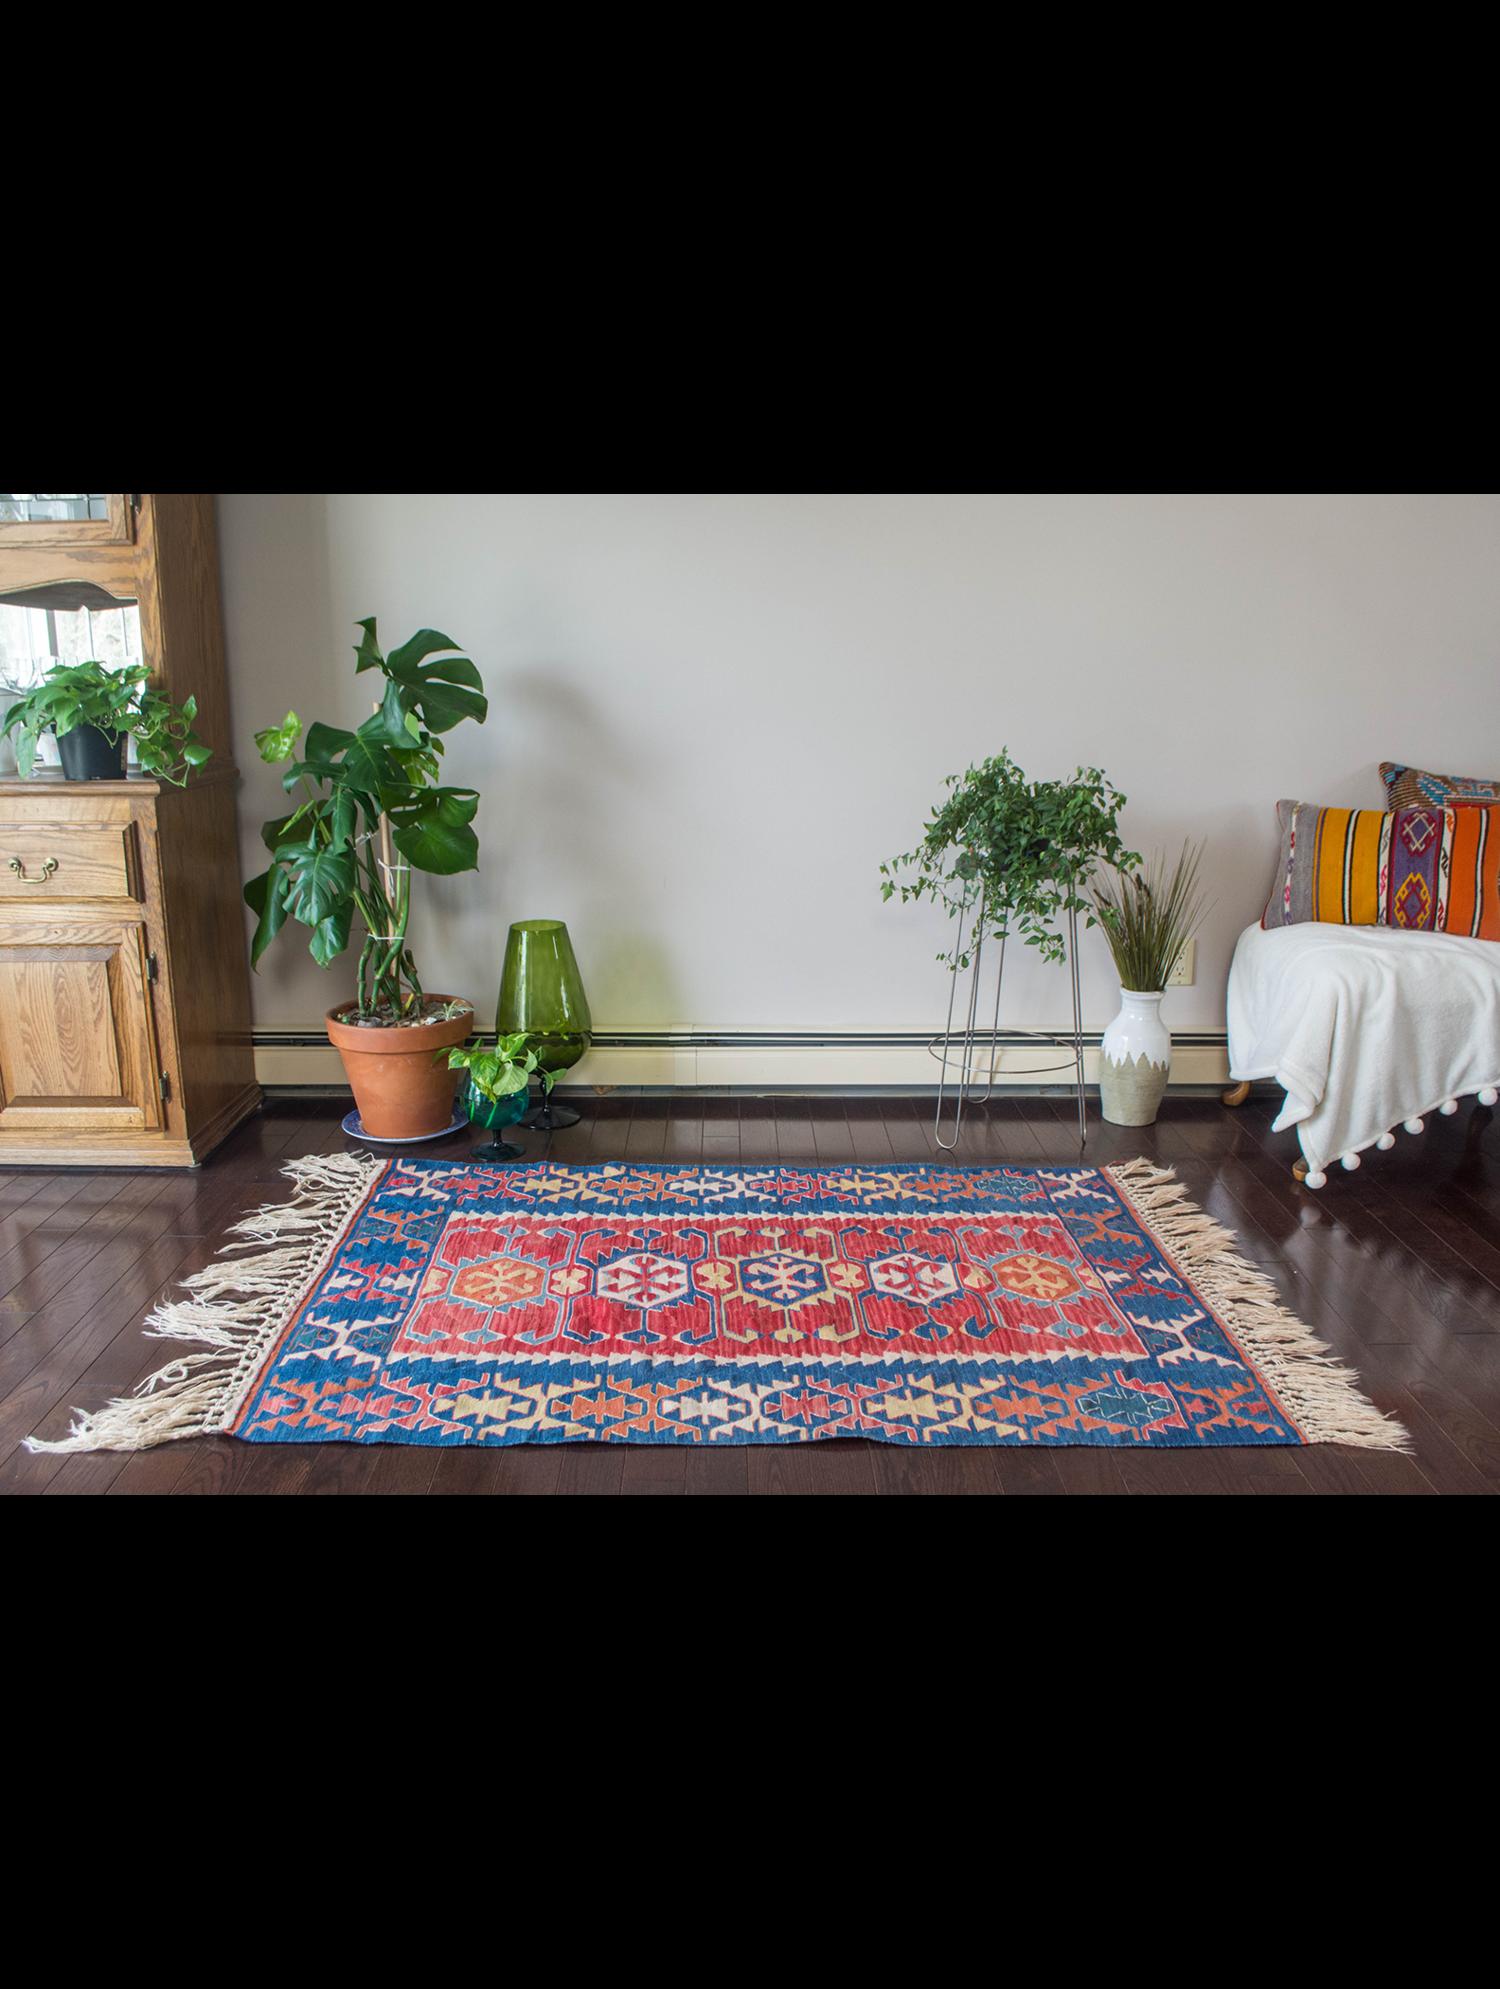 'Ender' Rug Vintage Kilim 3.5' x 5' Home decor, Rugs